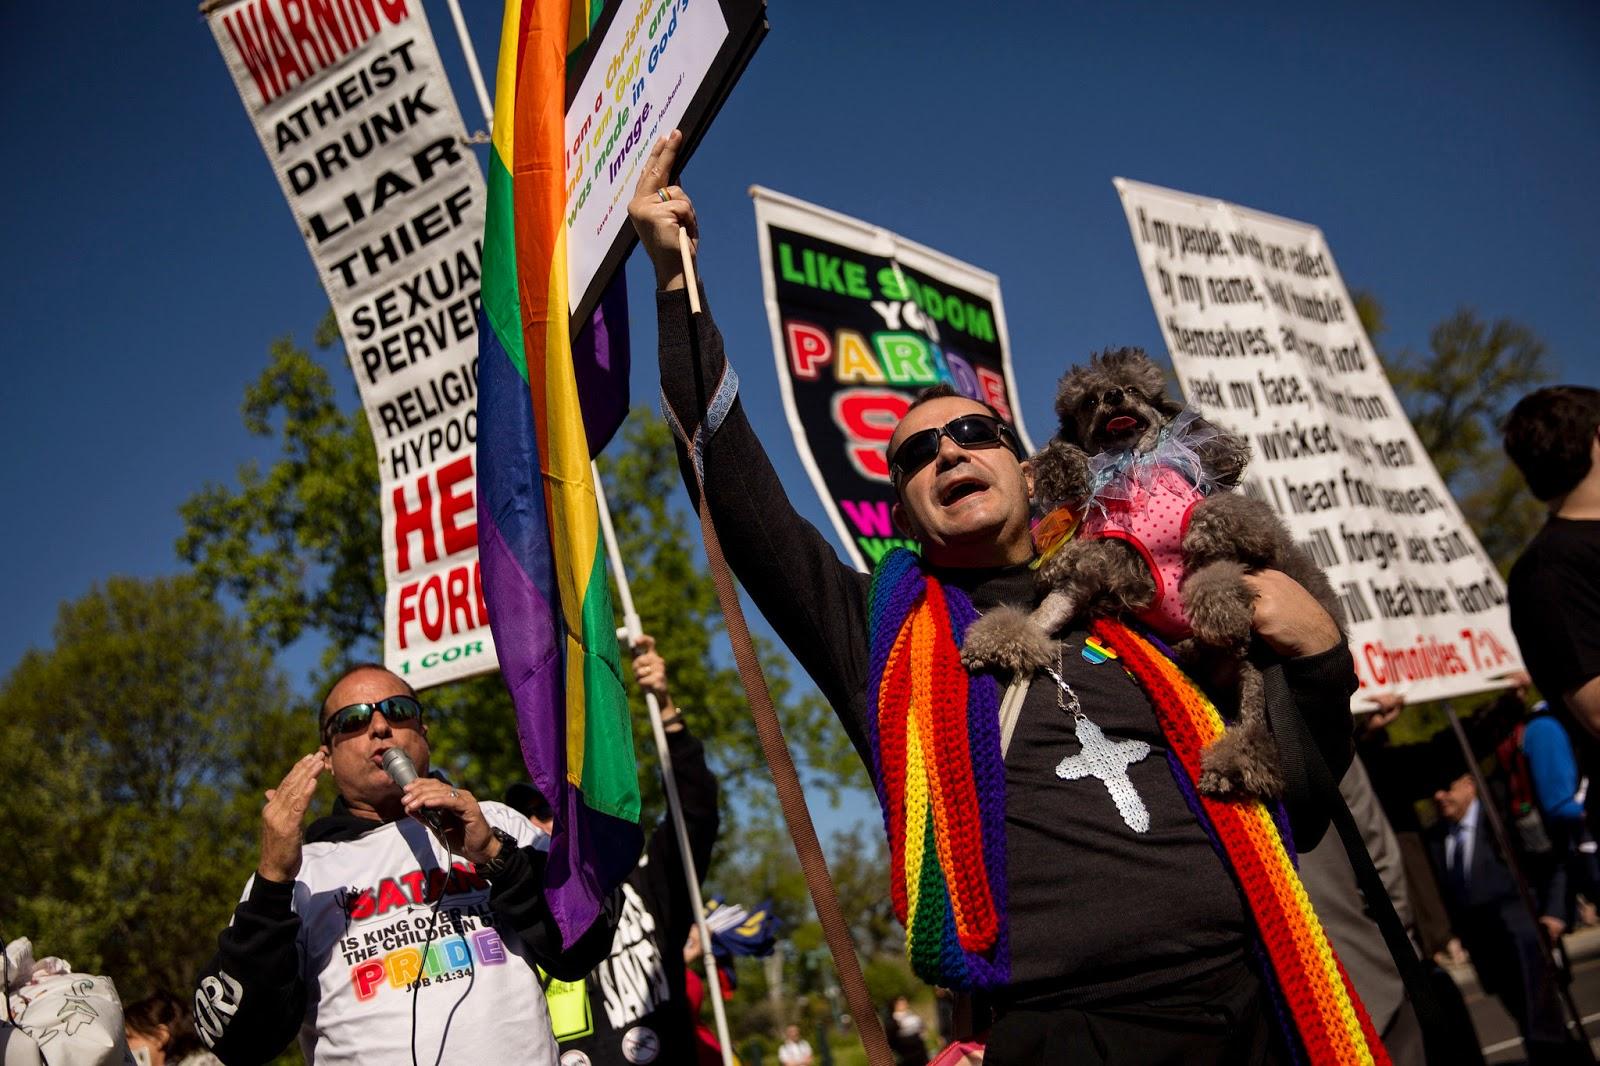 Supreme court starts new term, focused on healthcare, religion